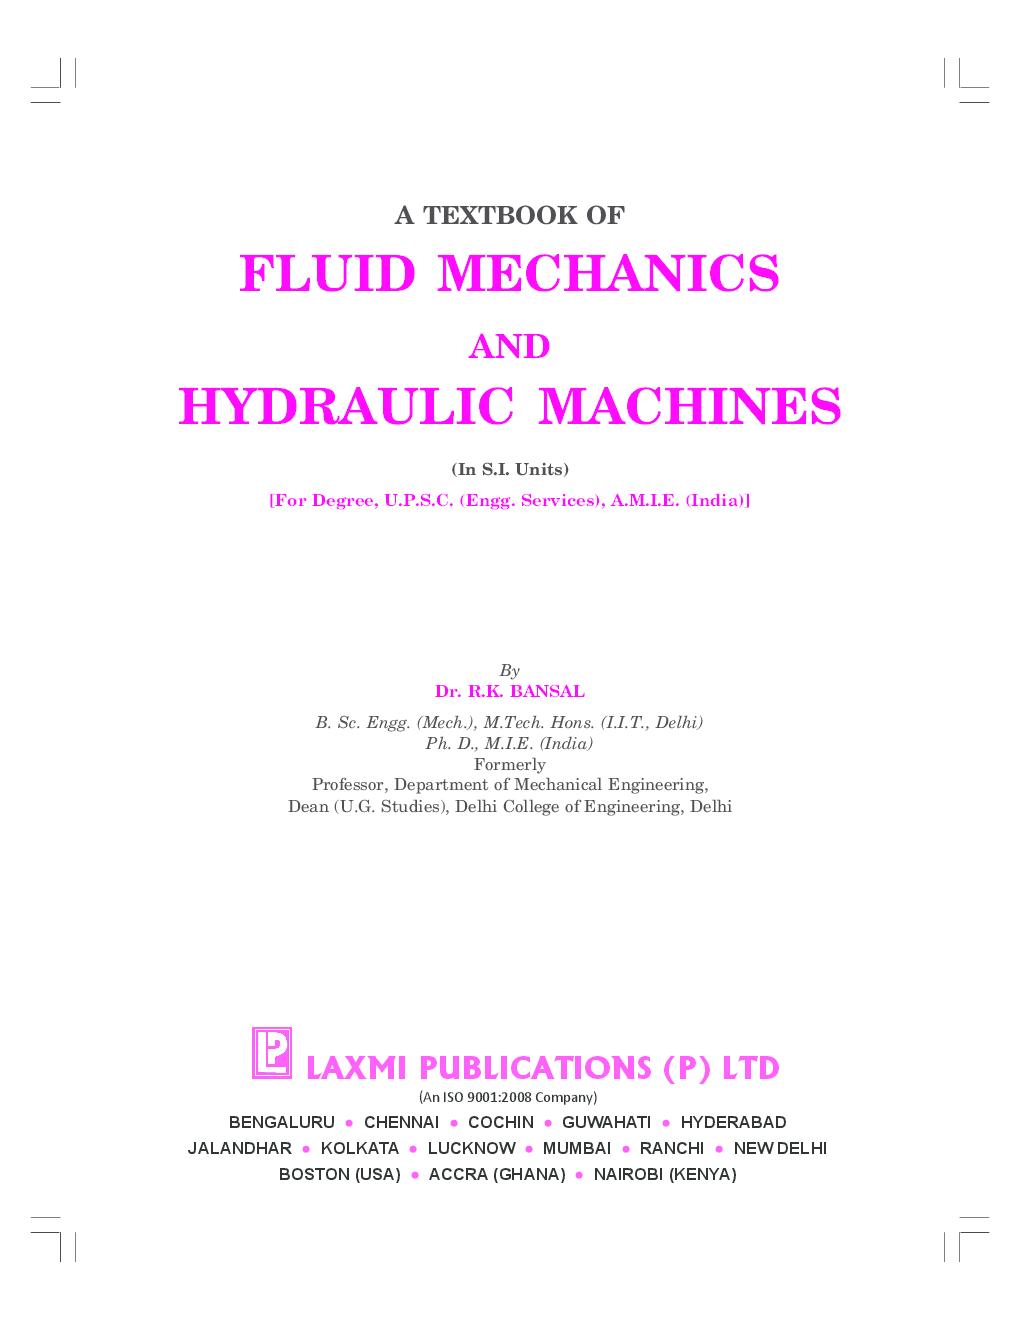 introduction to fluid mechanics and fluid machines pdf